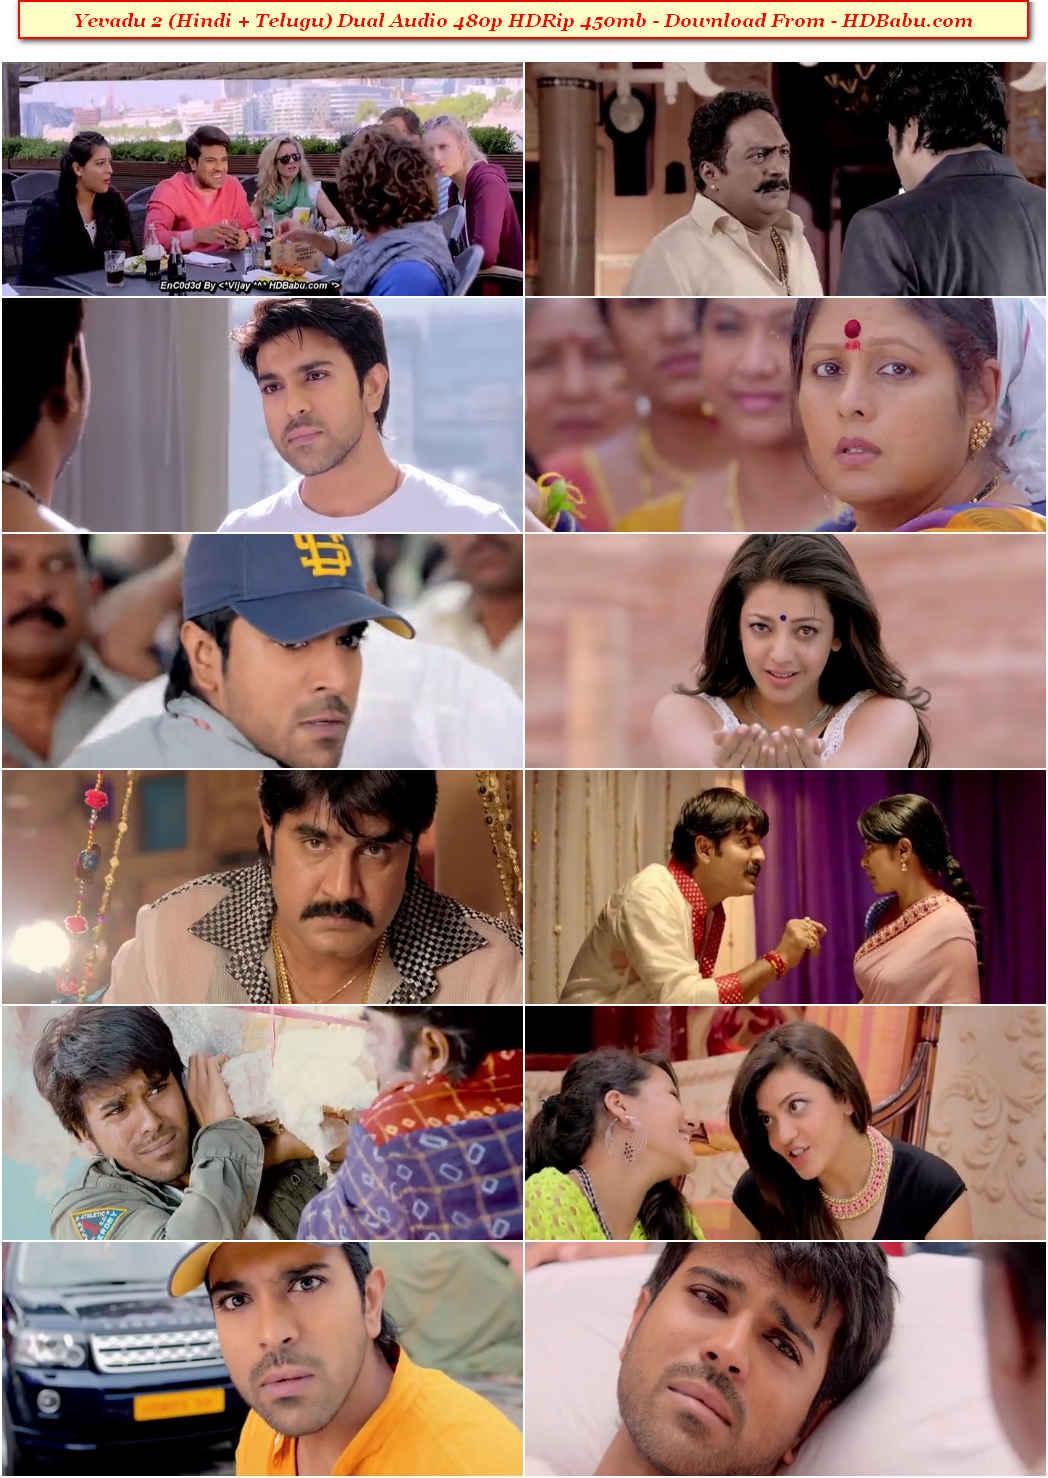 Yevadu 2 Hindi Dubbed Movie Download, Yevadu 2 (2016) Hindi Dual Audio 480p HDRip 450MB